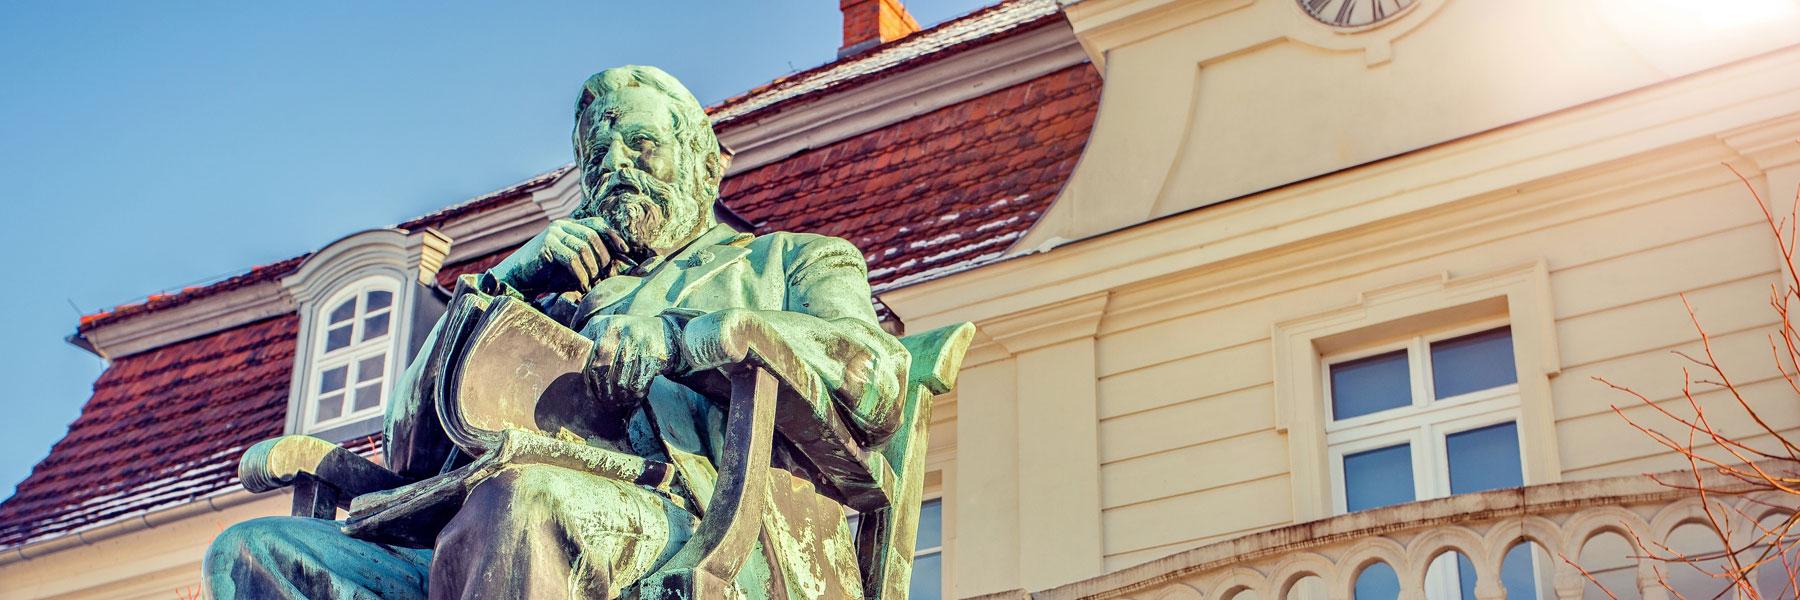 Denkmal - Fritz-Reuter-Literaturmuseum